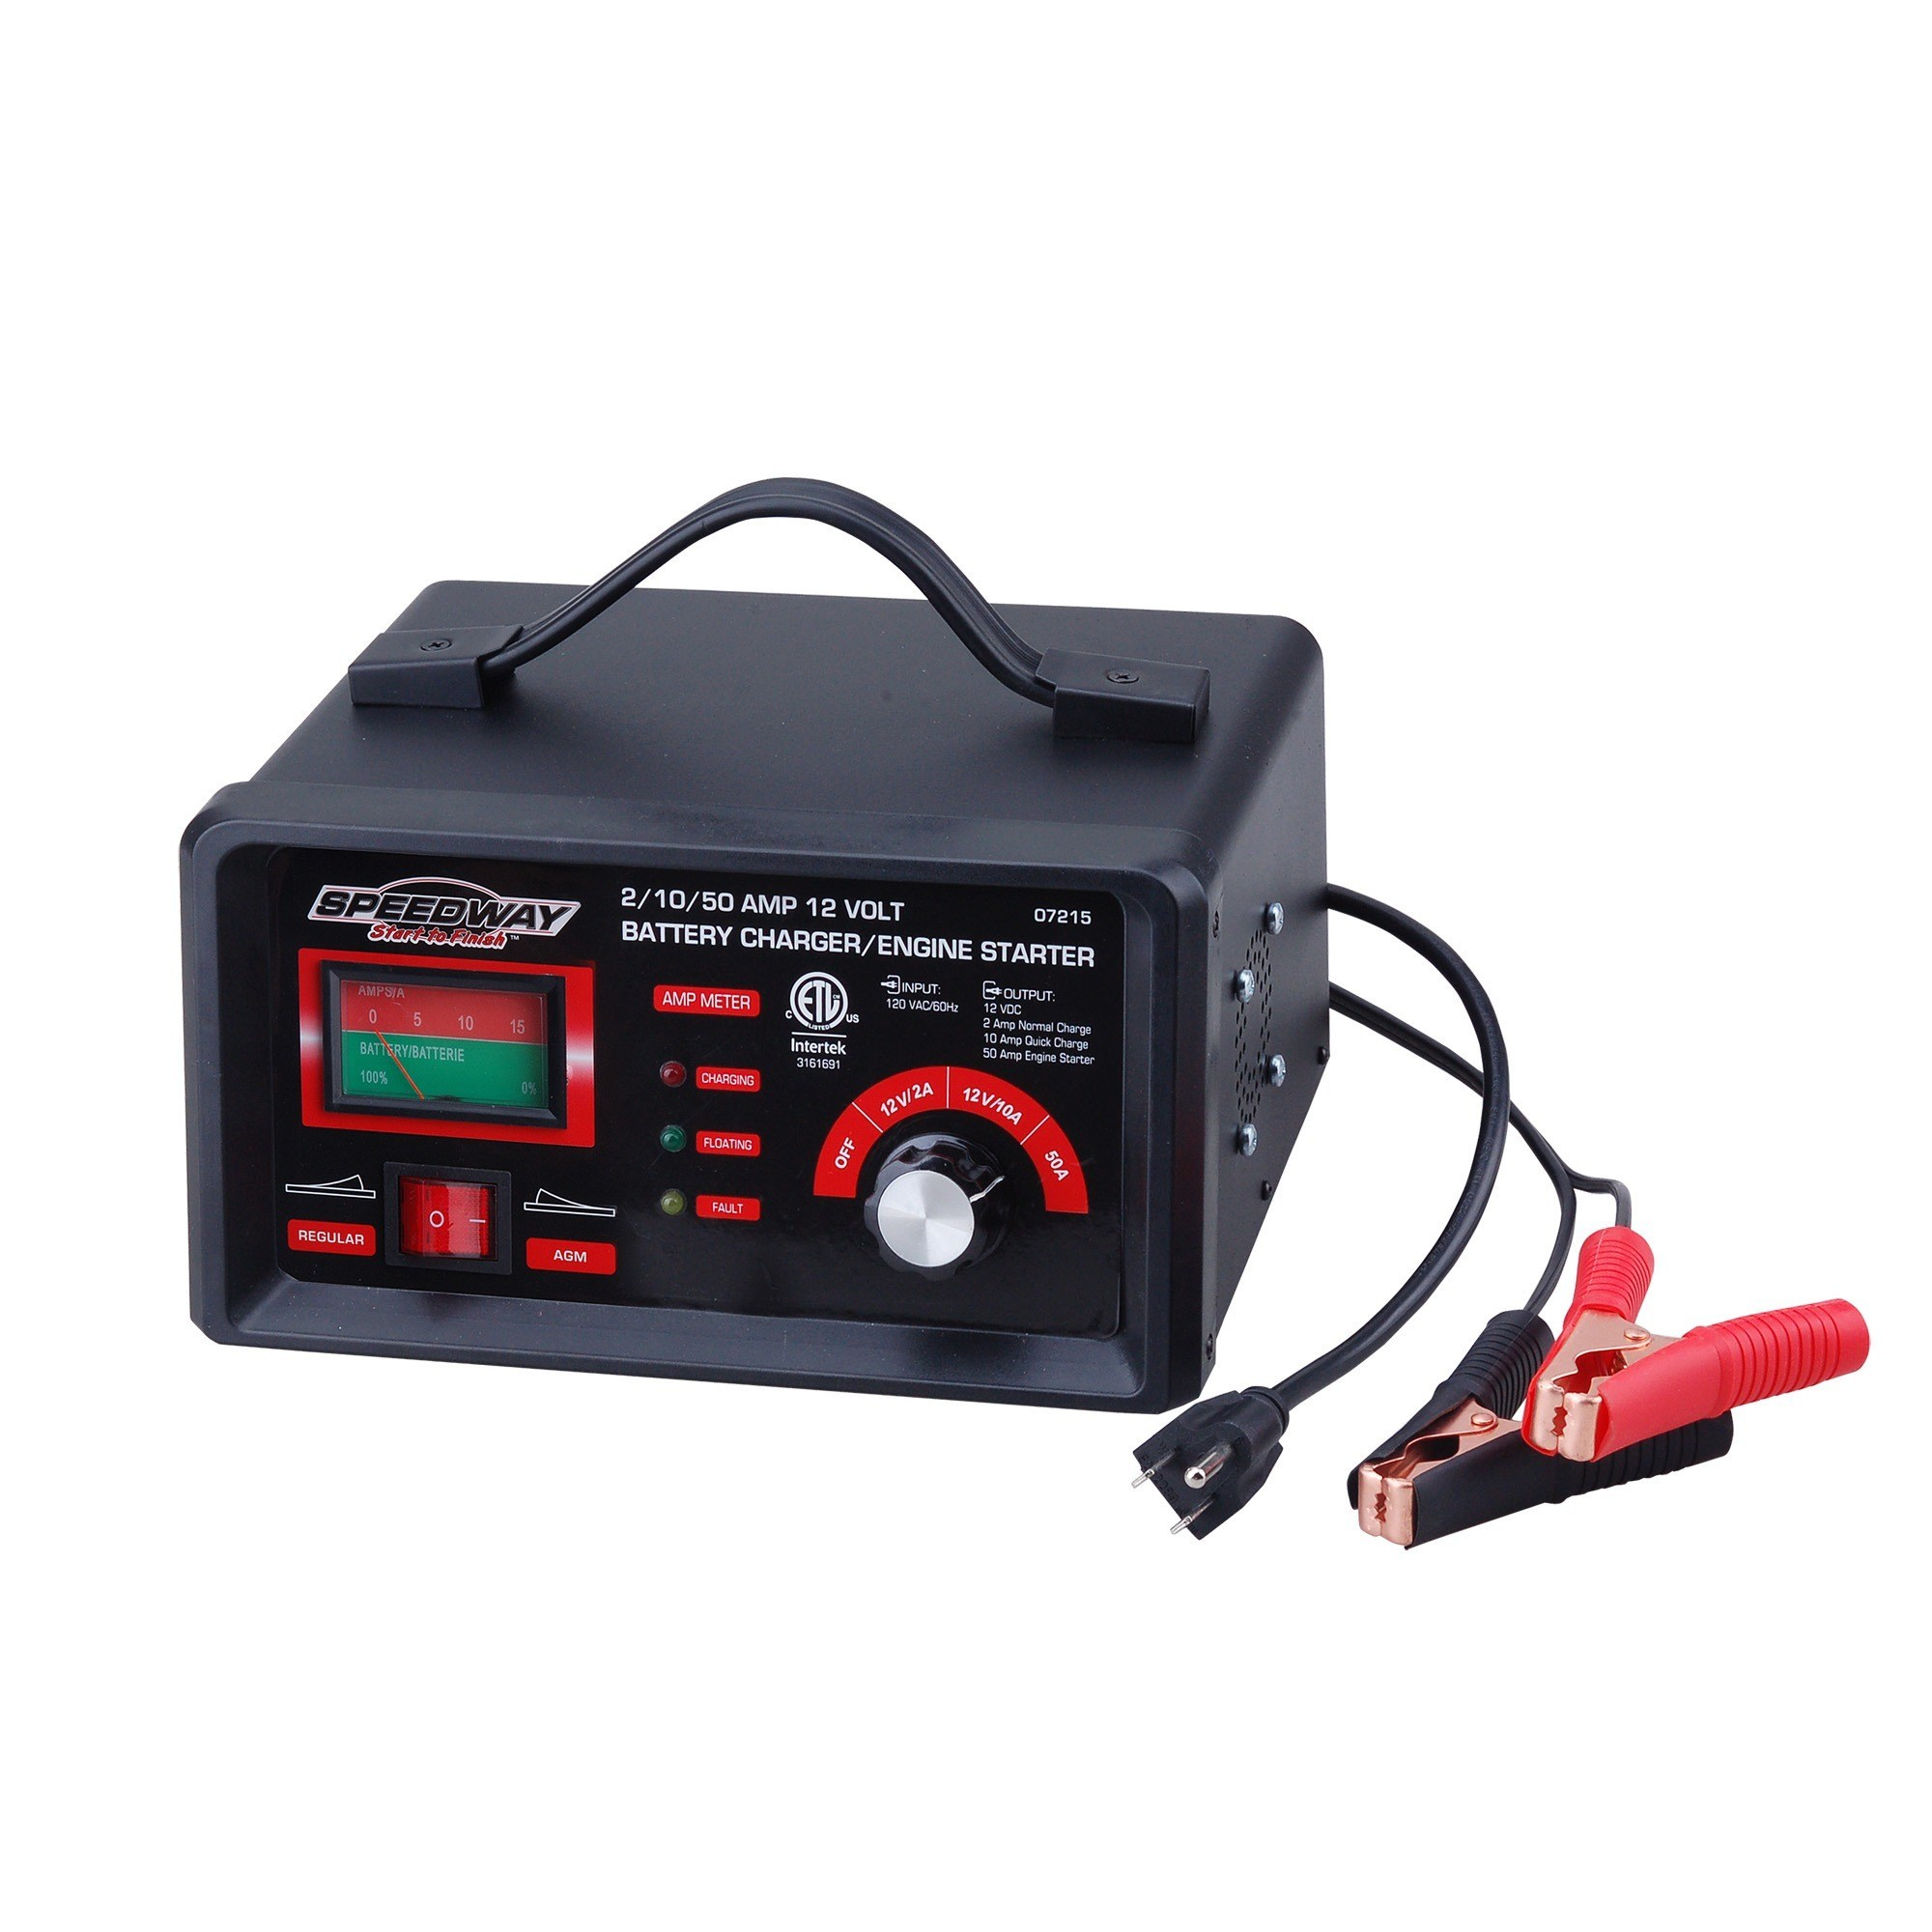 Speedway 2 10 50 Amp 12 Volt Battery Charger Engine Starter